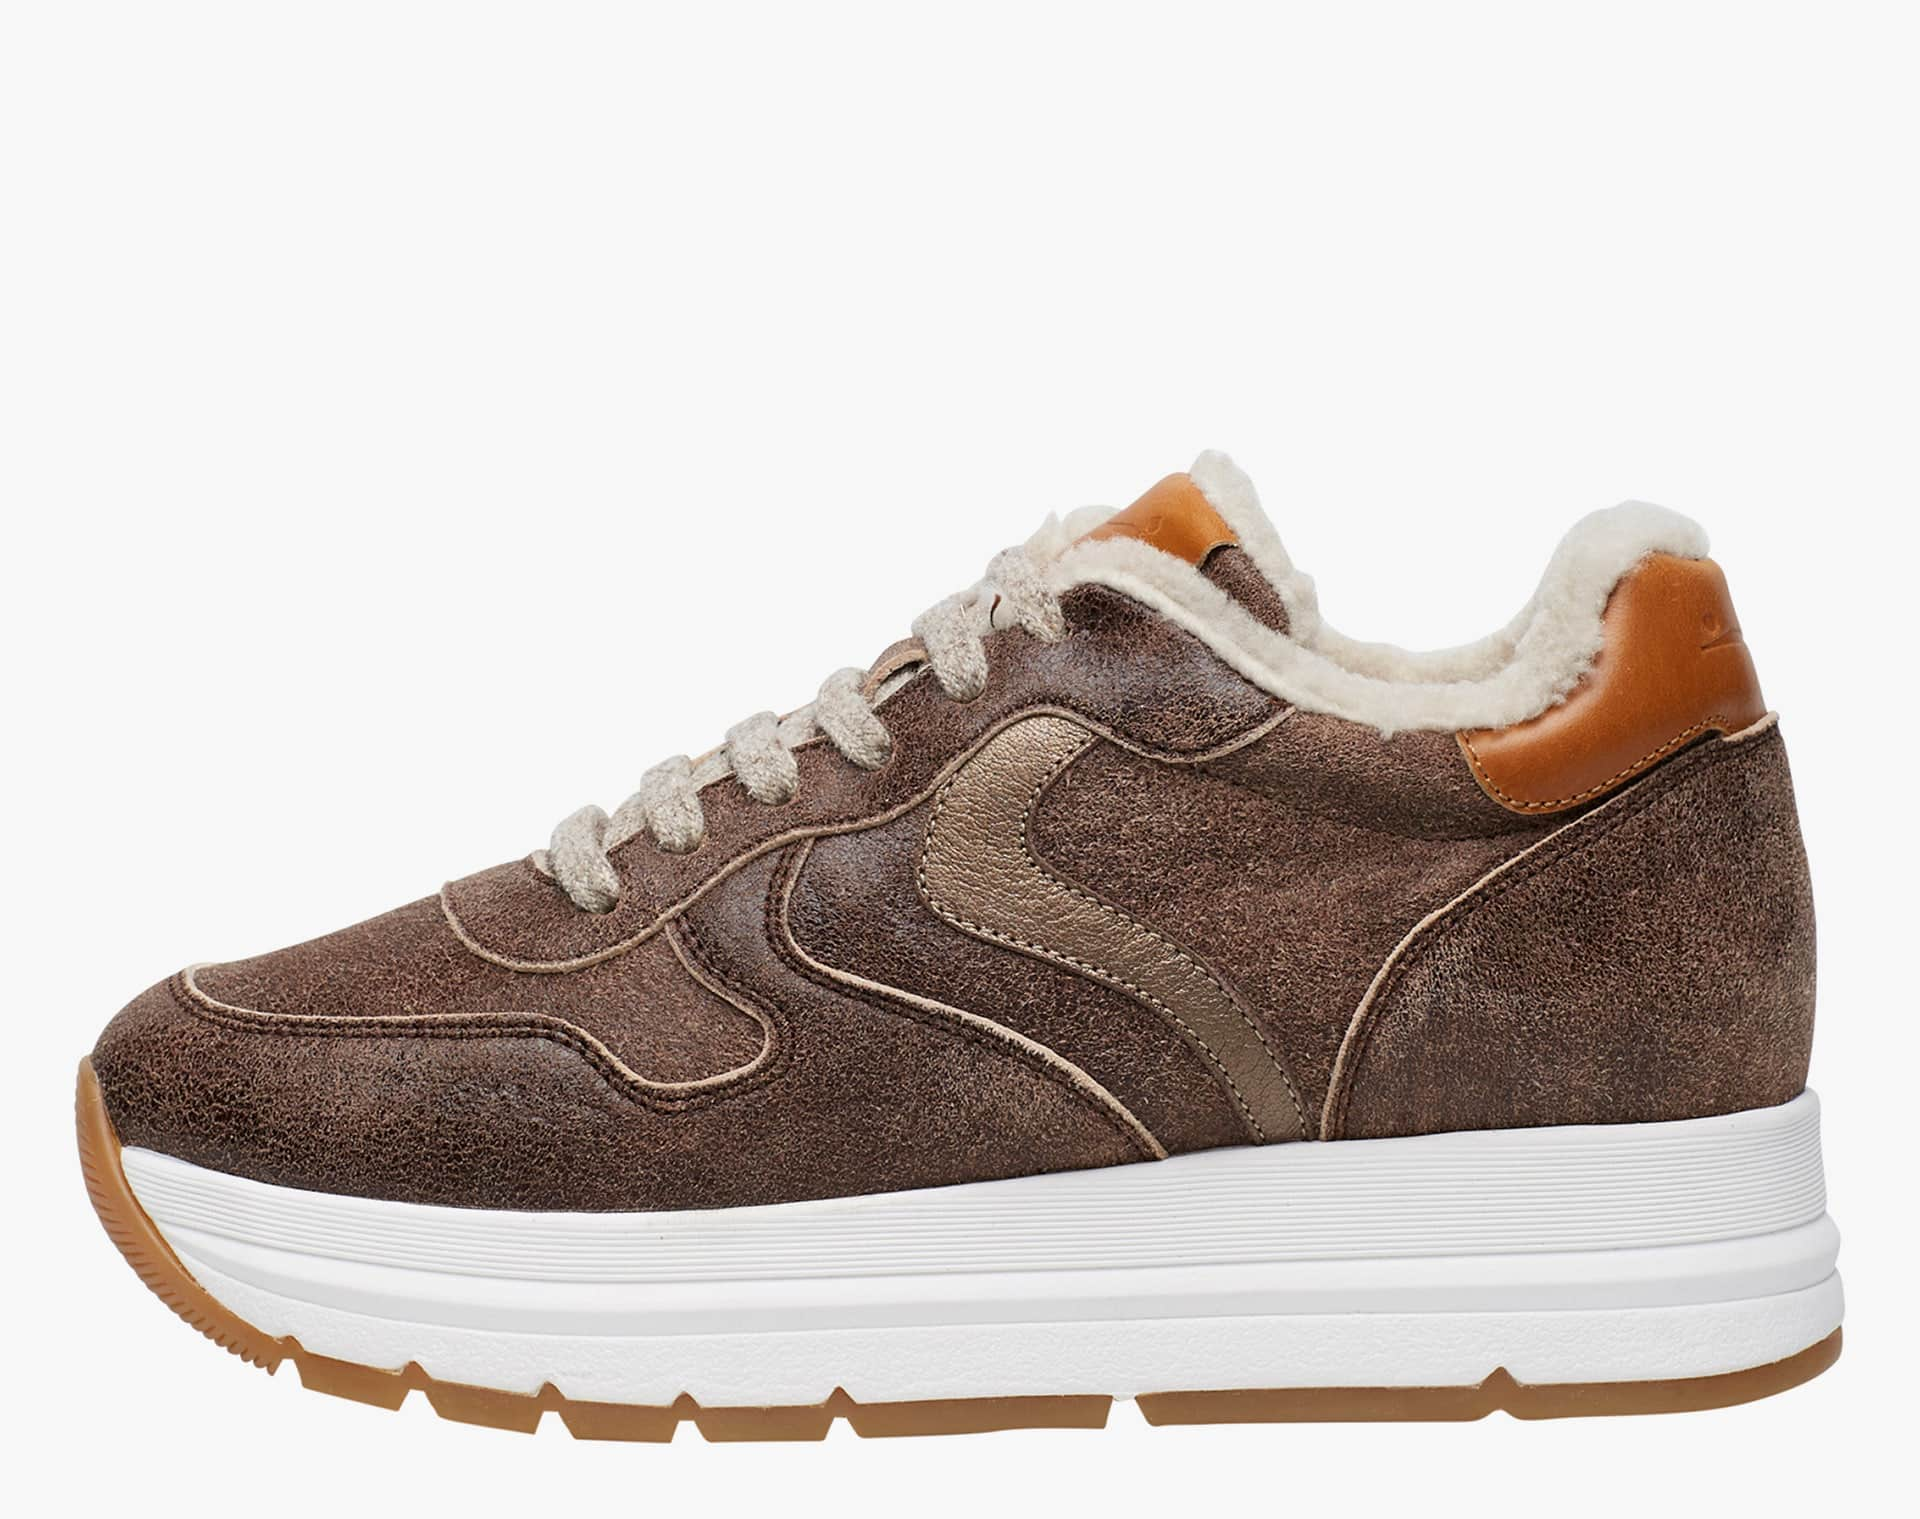 MARAN FUR - Sneaker in pelle vintage  - Topo/Bruciato